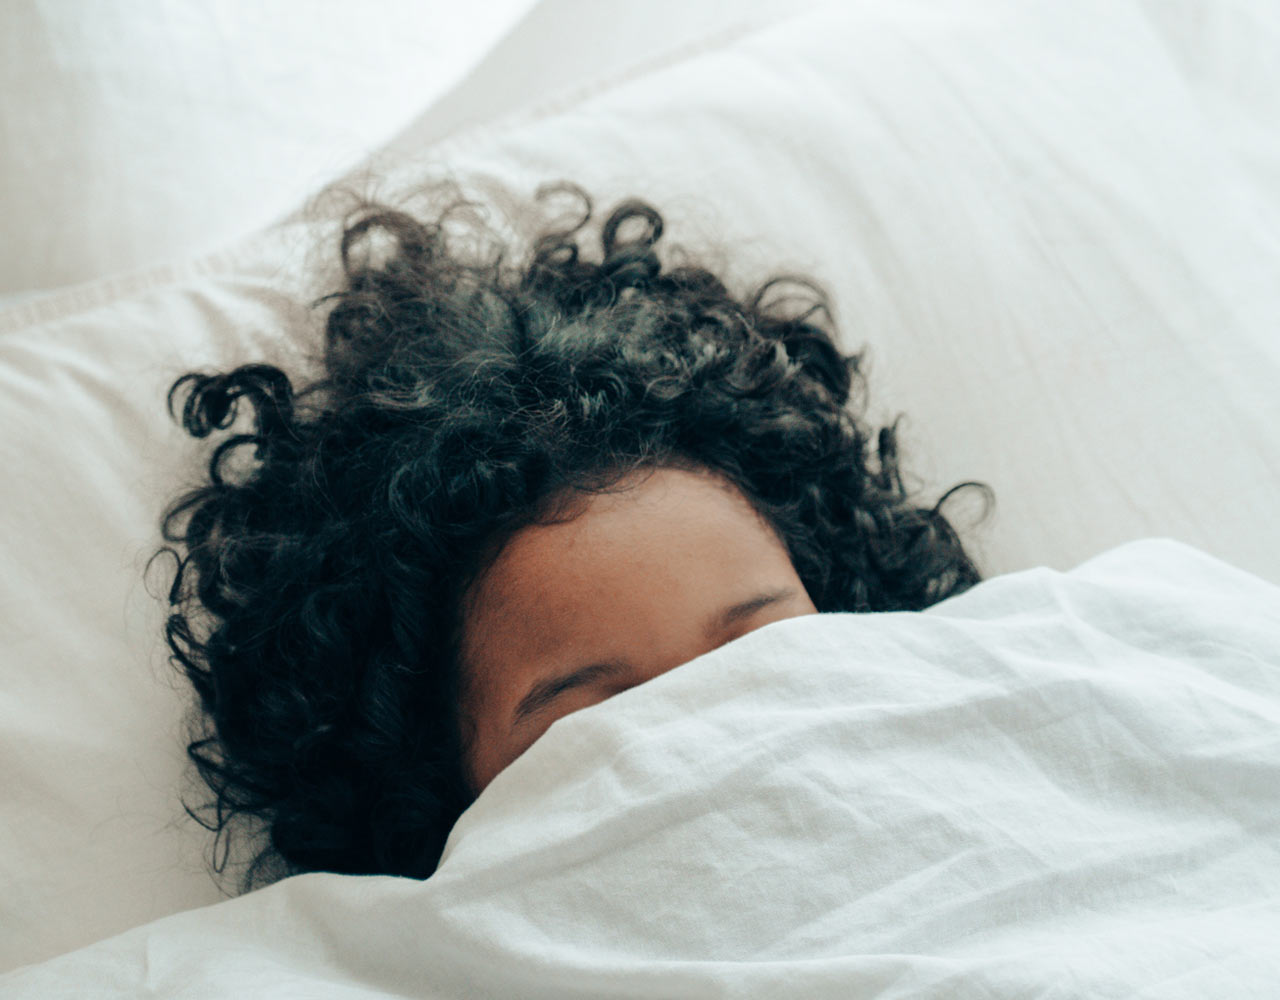 Get Eight Hours of Sleep Regularly